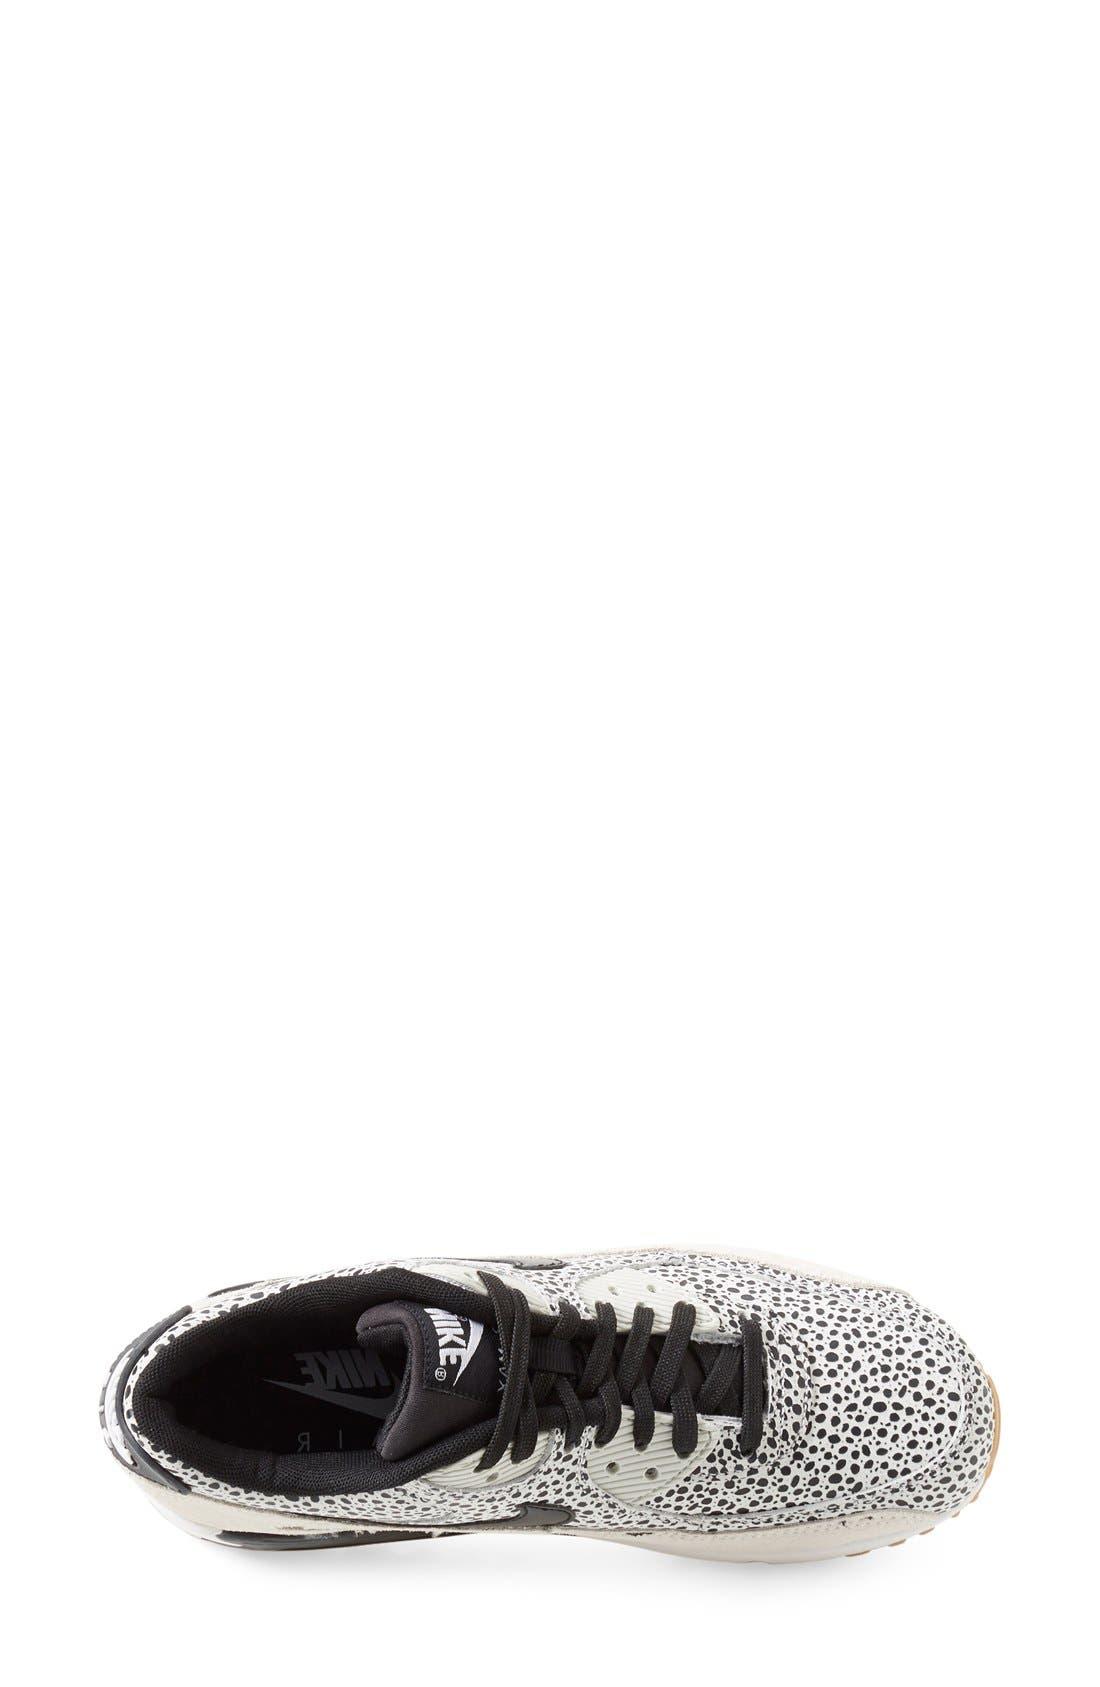 'Air Max 90 - Premium' Sneaker,                             Alternate thumbnail 3, color,                             White/ Black/ Brown